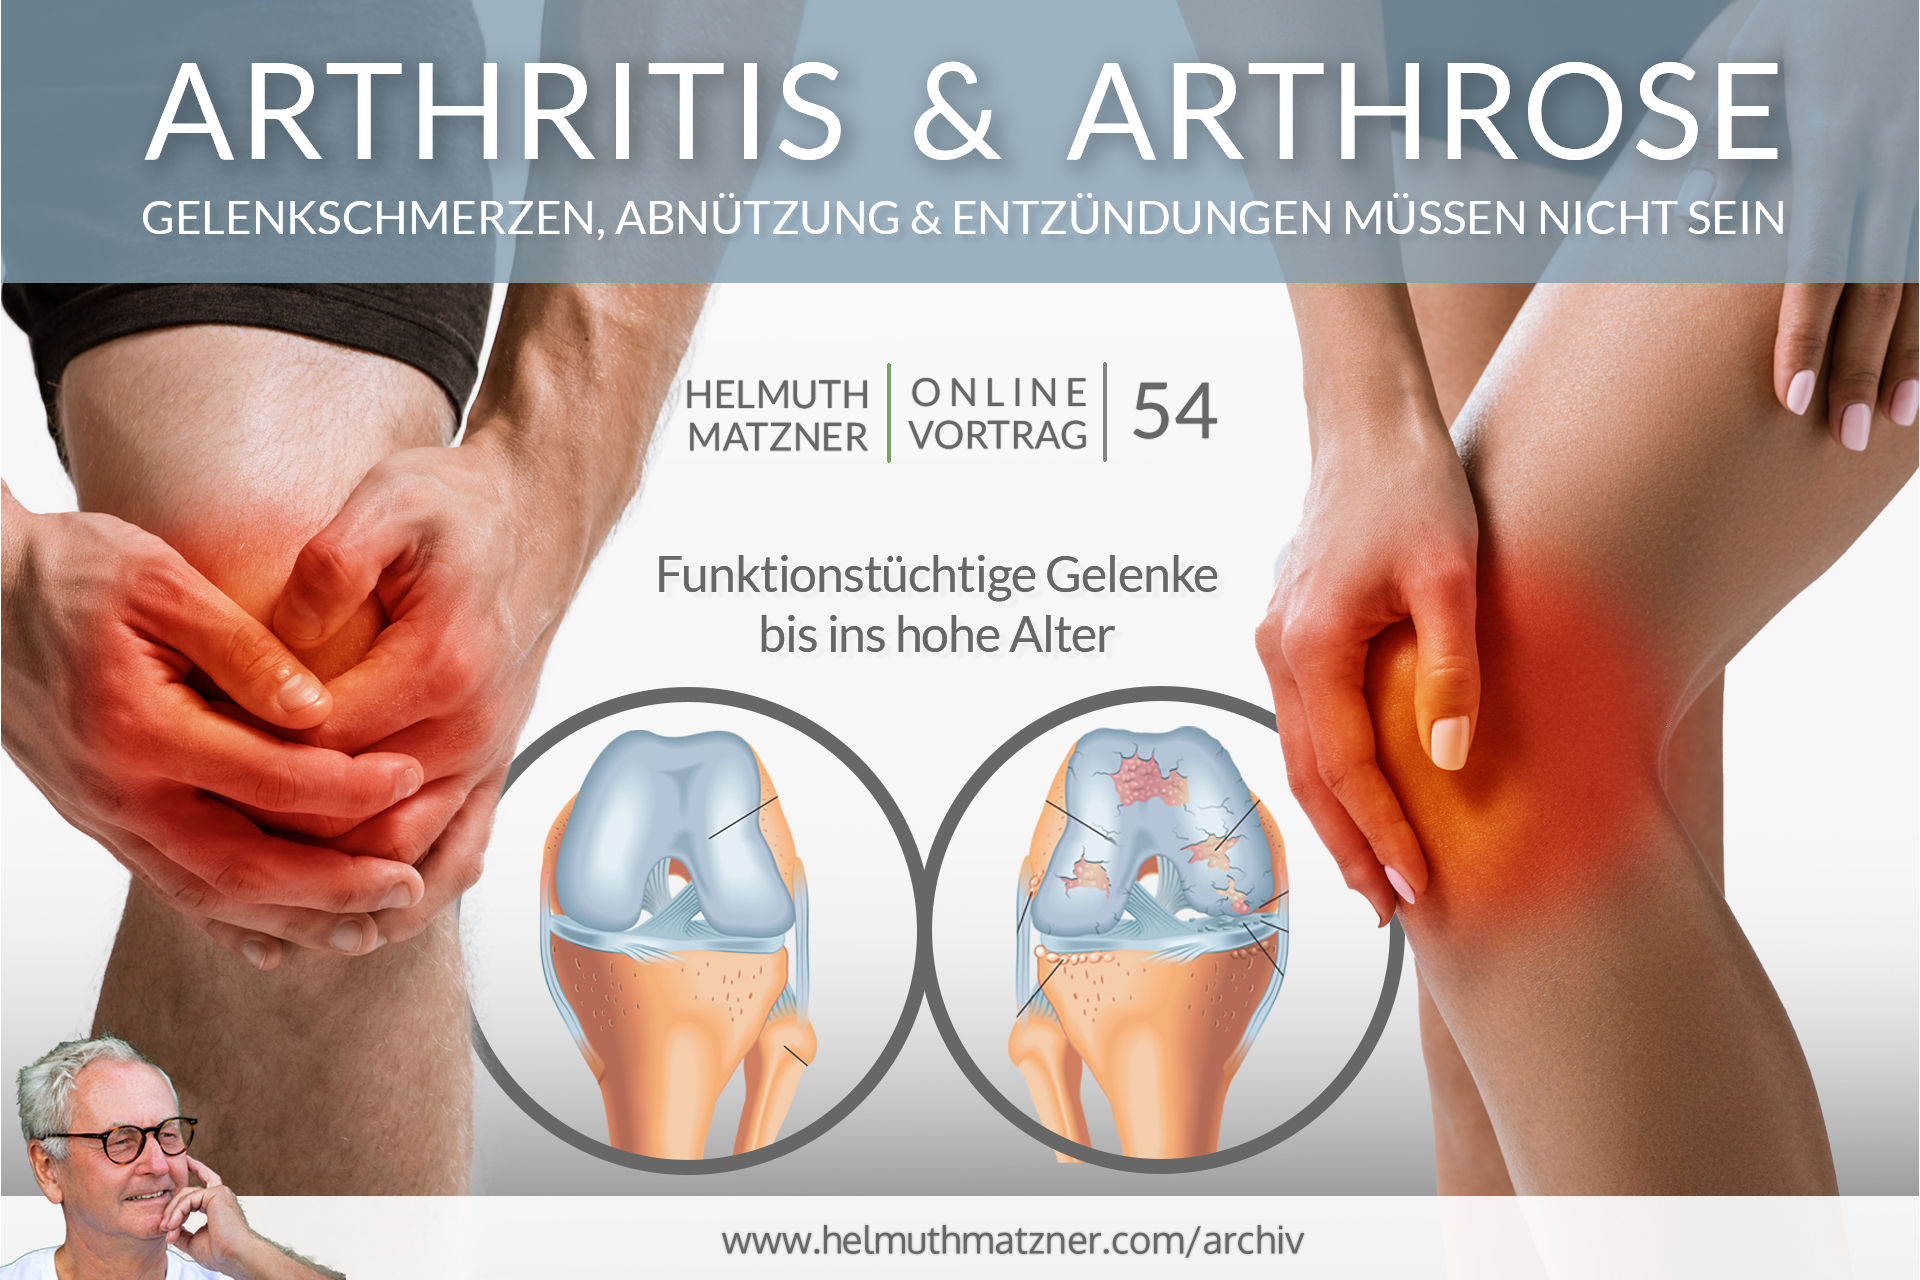 Helmuth Matzner - Online-Vortrag 54 - Arthritis Arthrose - Archiv v05